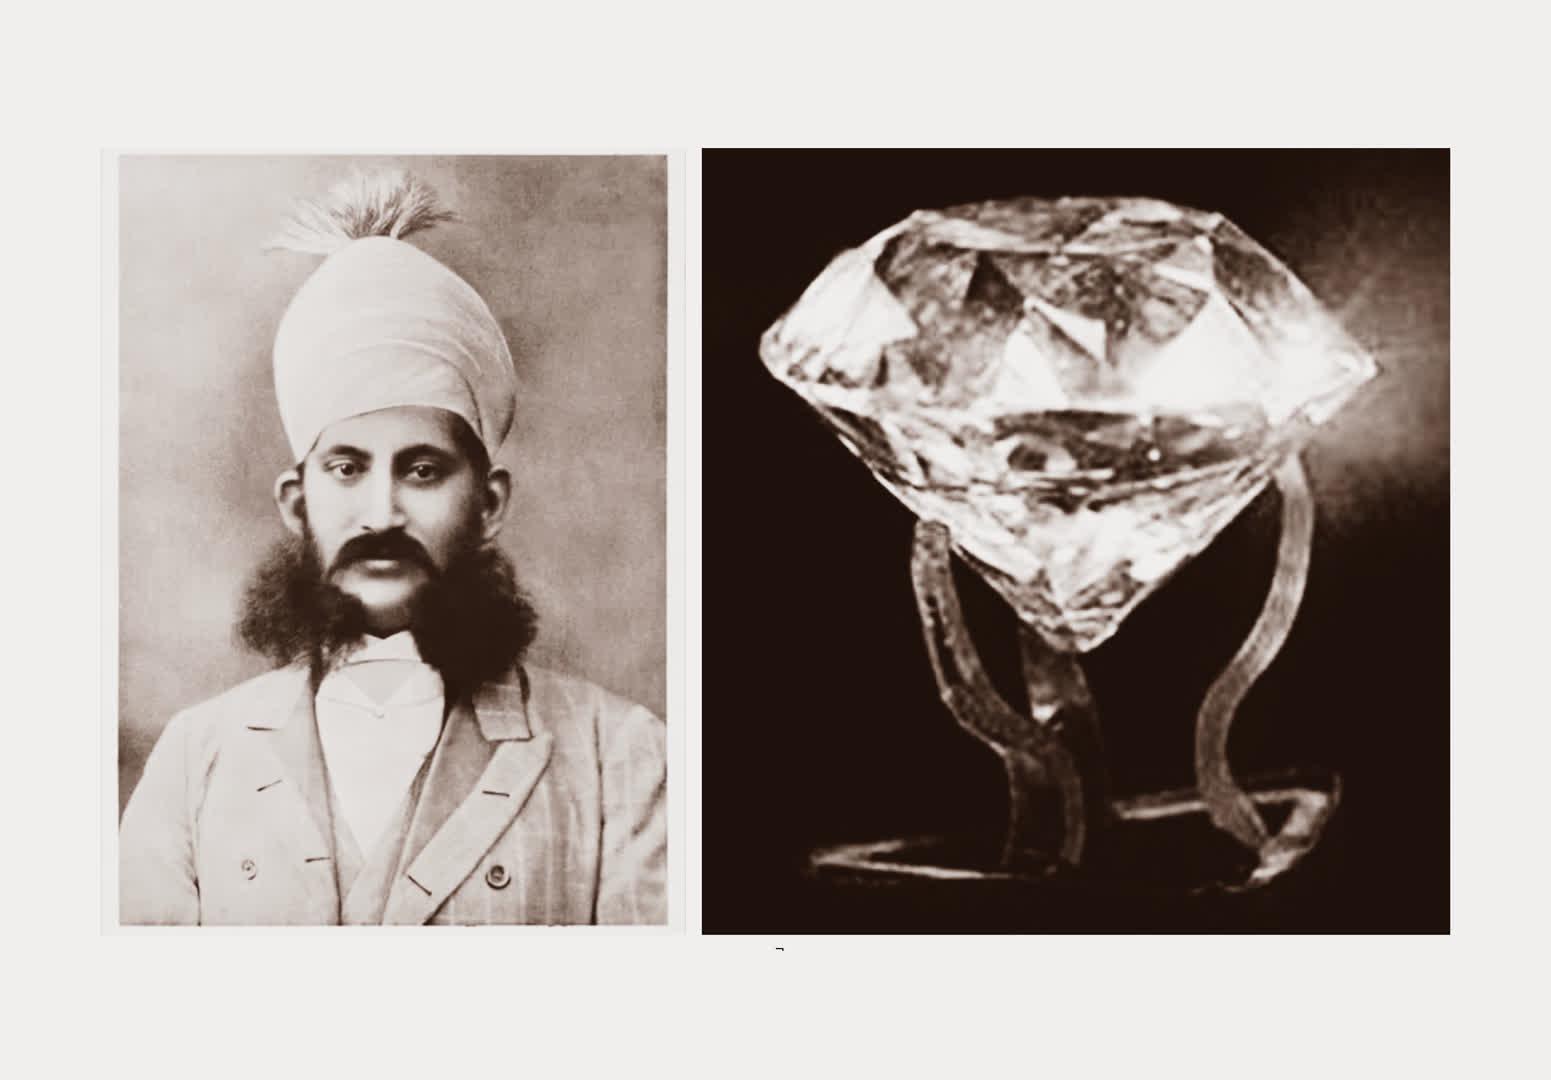 Diamond in a Shoe: The Jacob Diamond